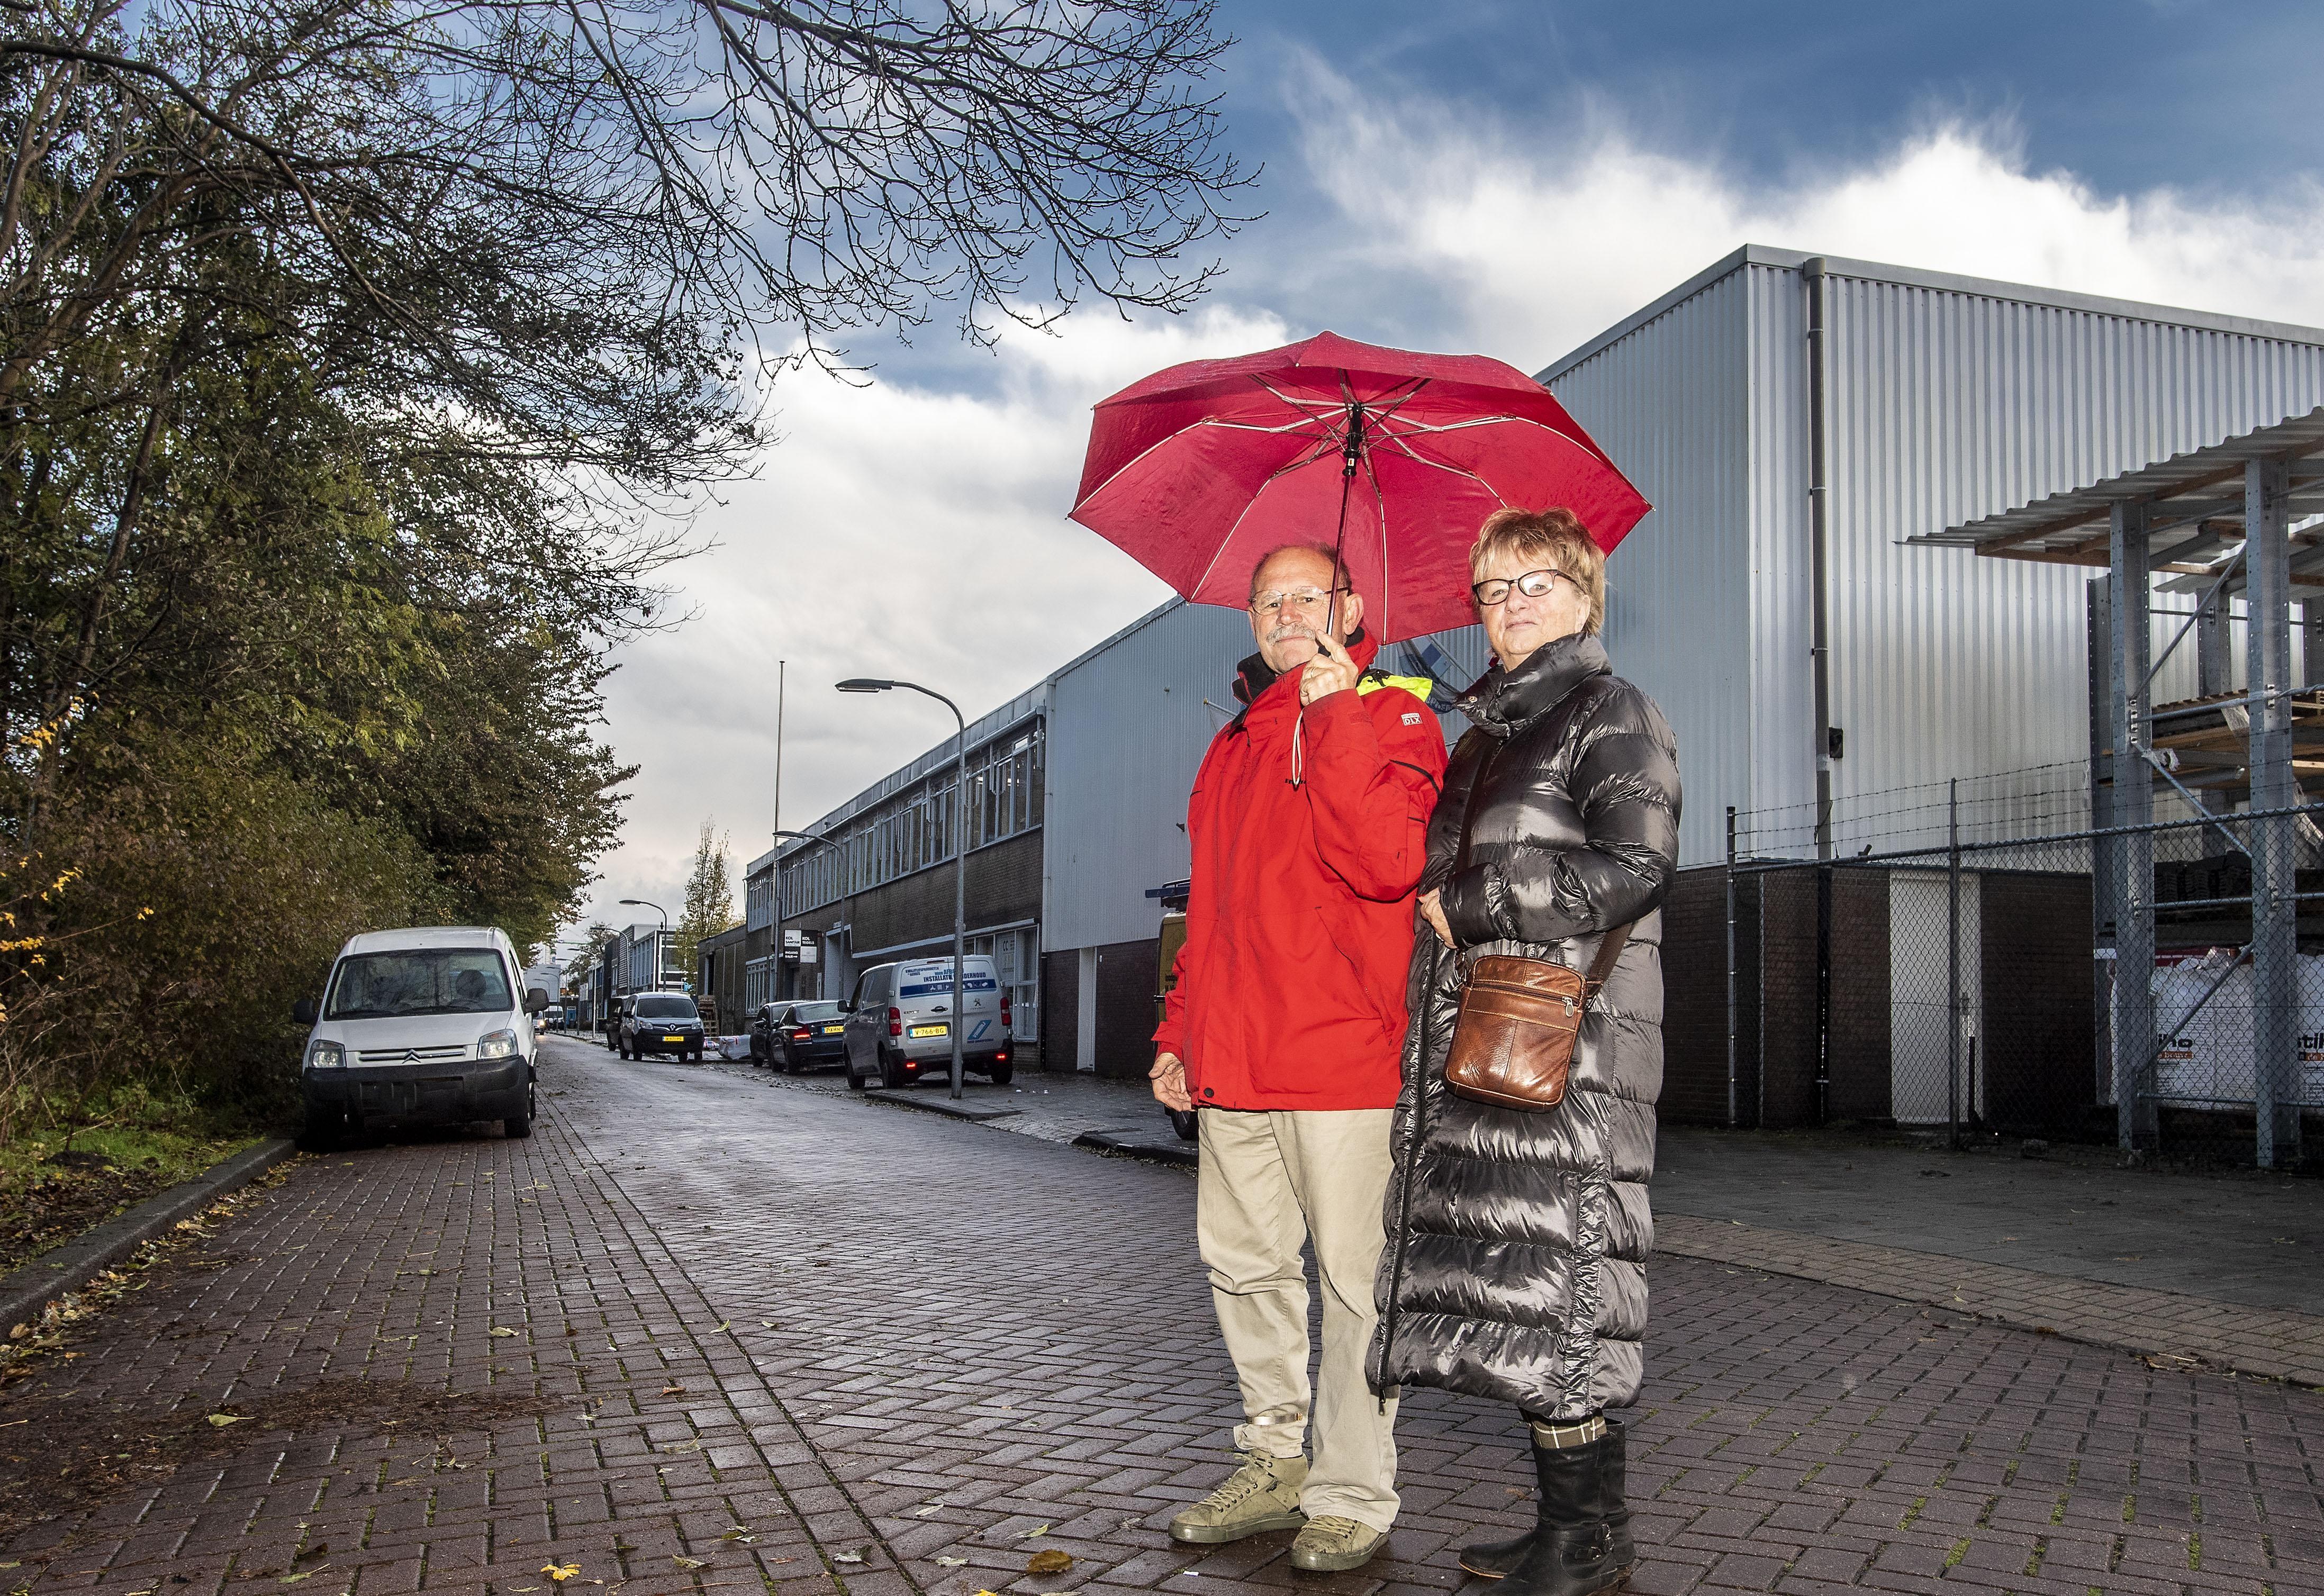 Wanhoopsoffensief van buurt tegen massale bouw in Haarlem-Zuidwest - Haarlems Dagblad